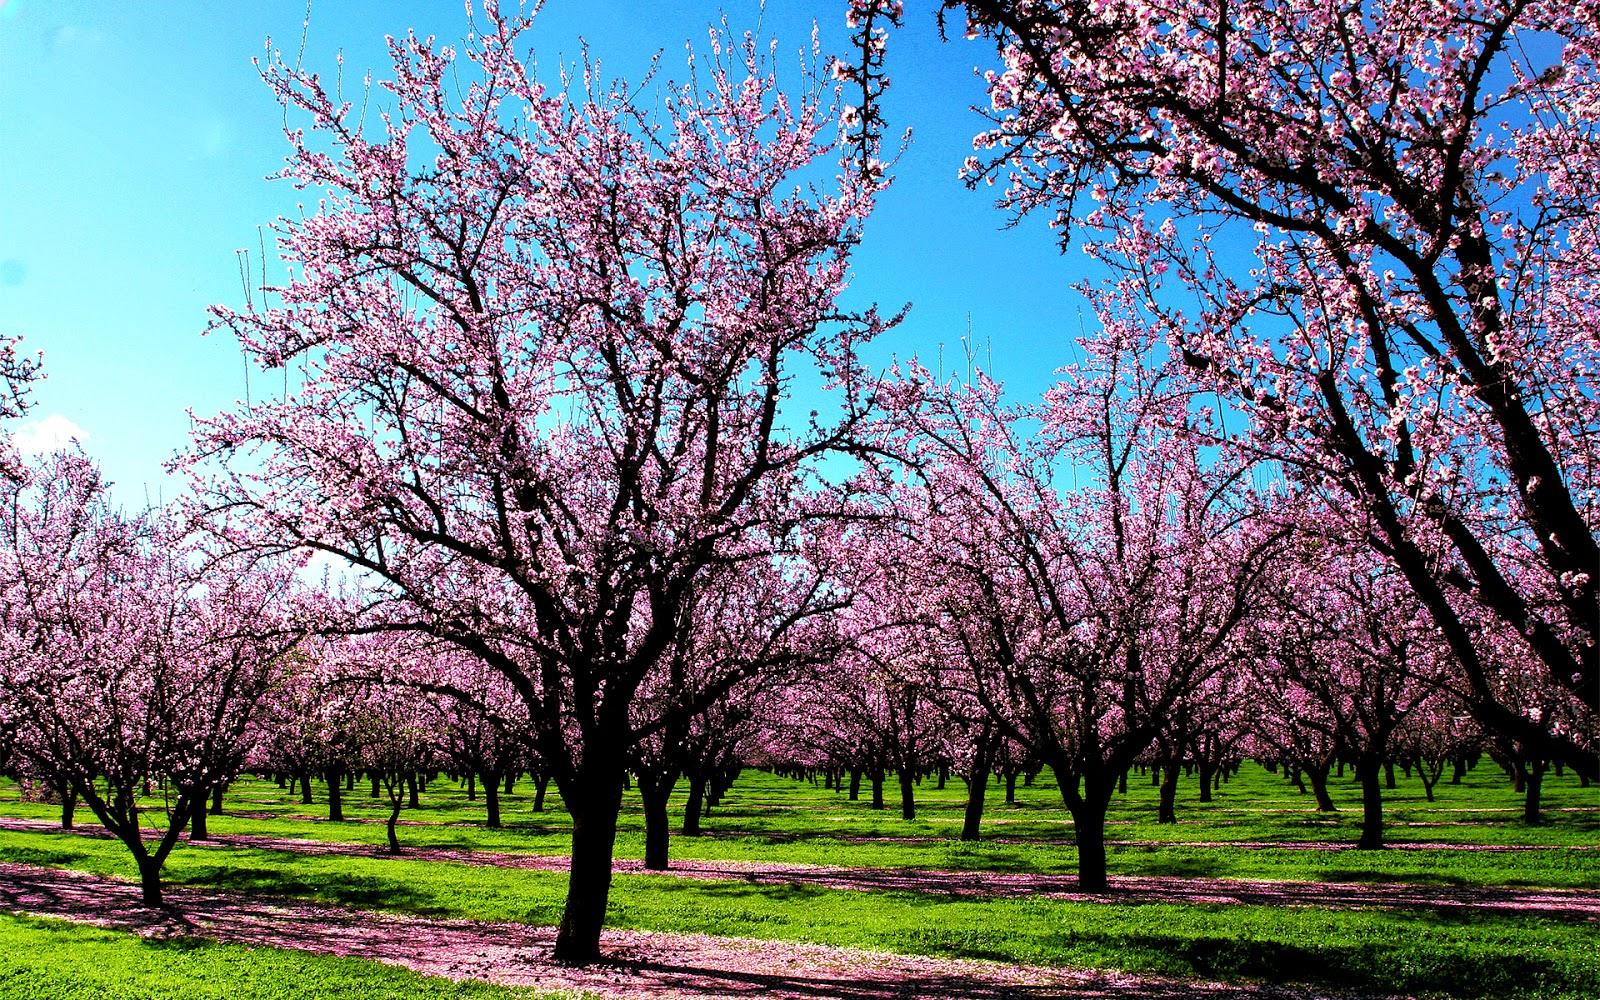 2015 SpringSummerWinter Seasons Desktop Images Full Screen 1600x1000